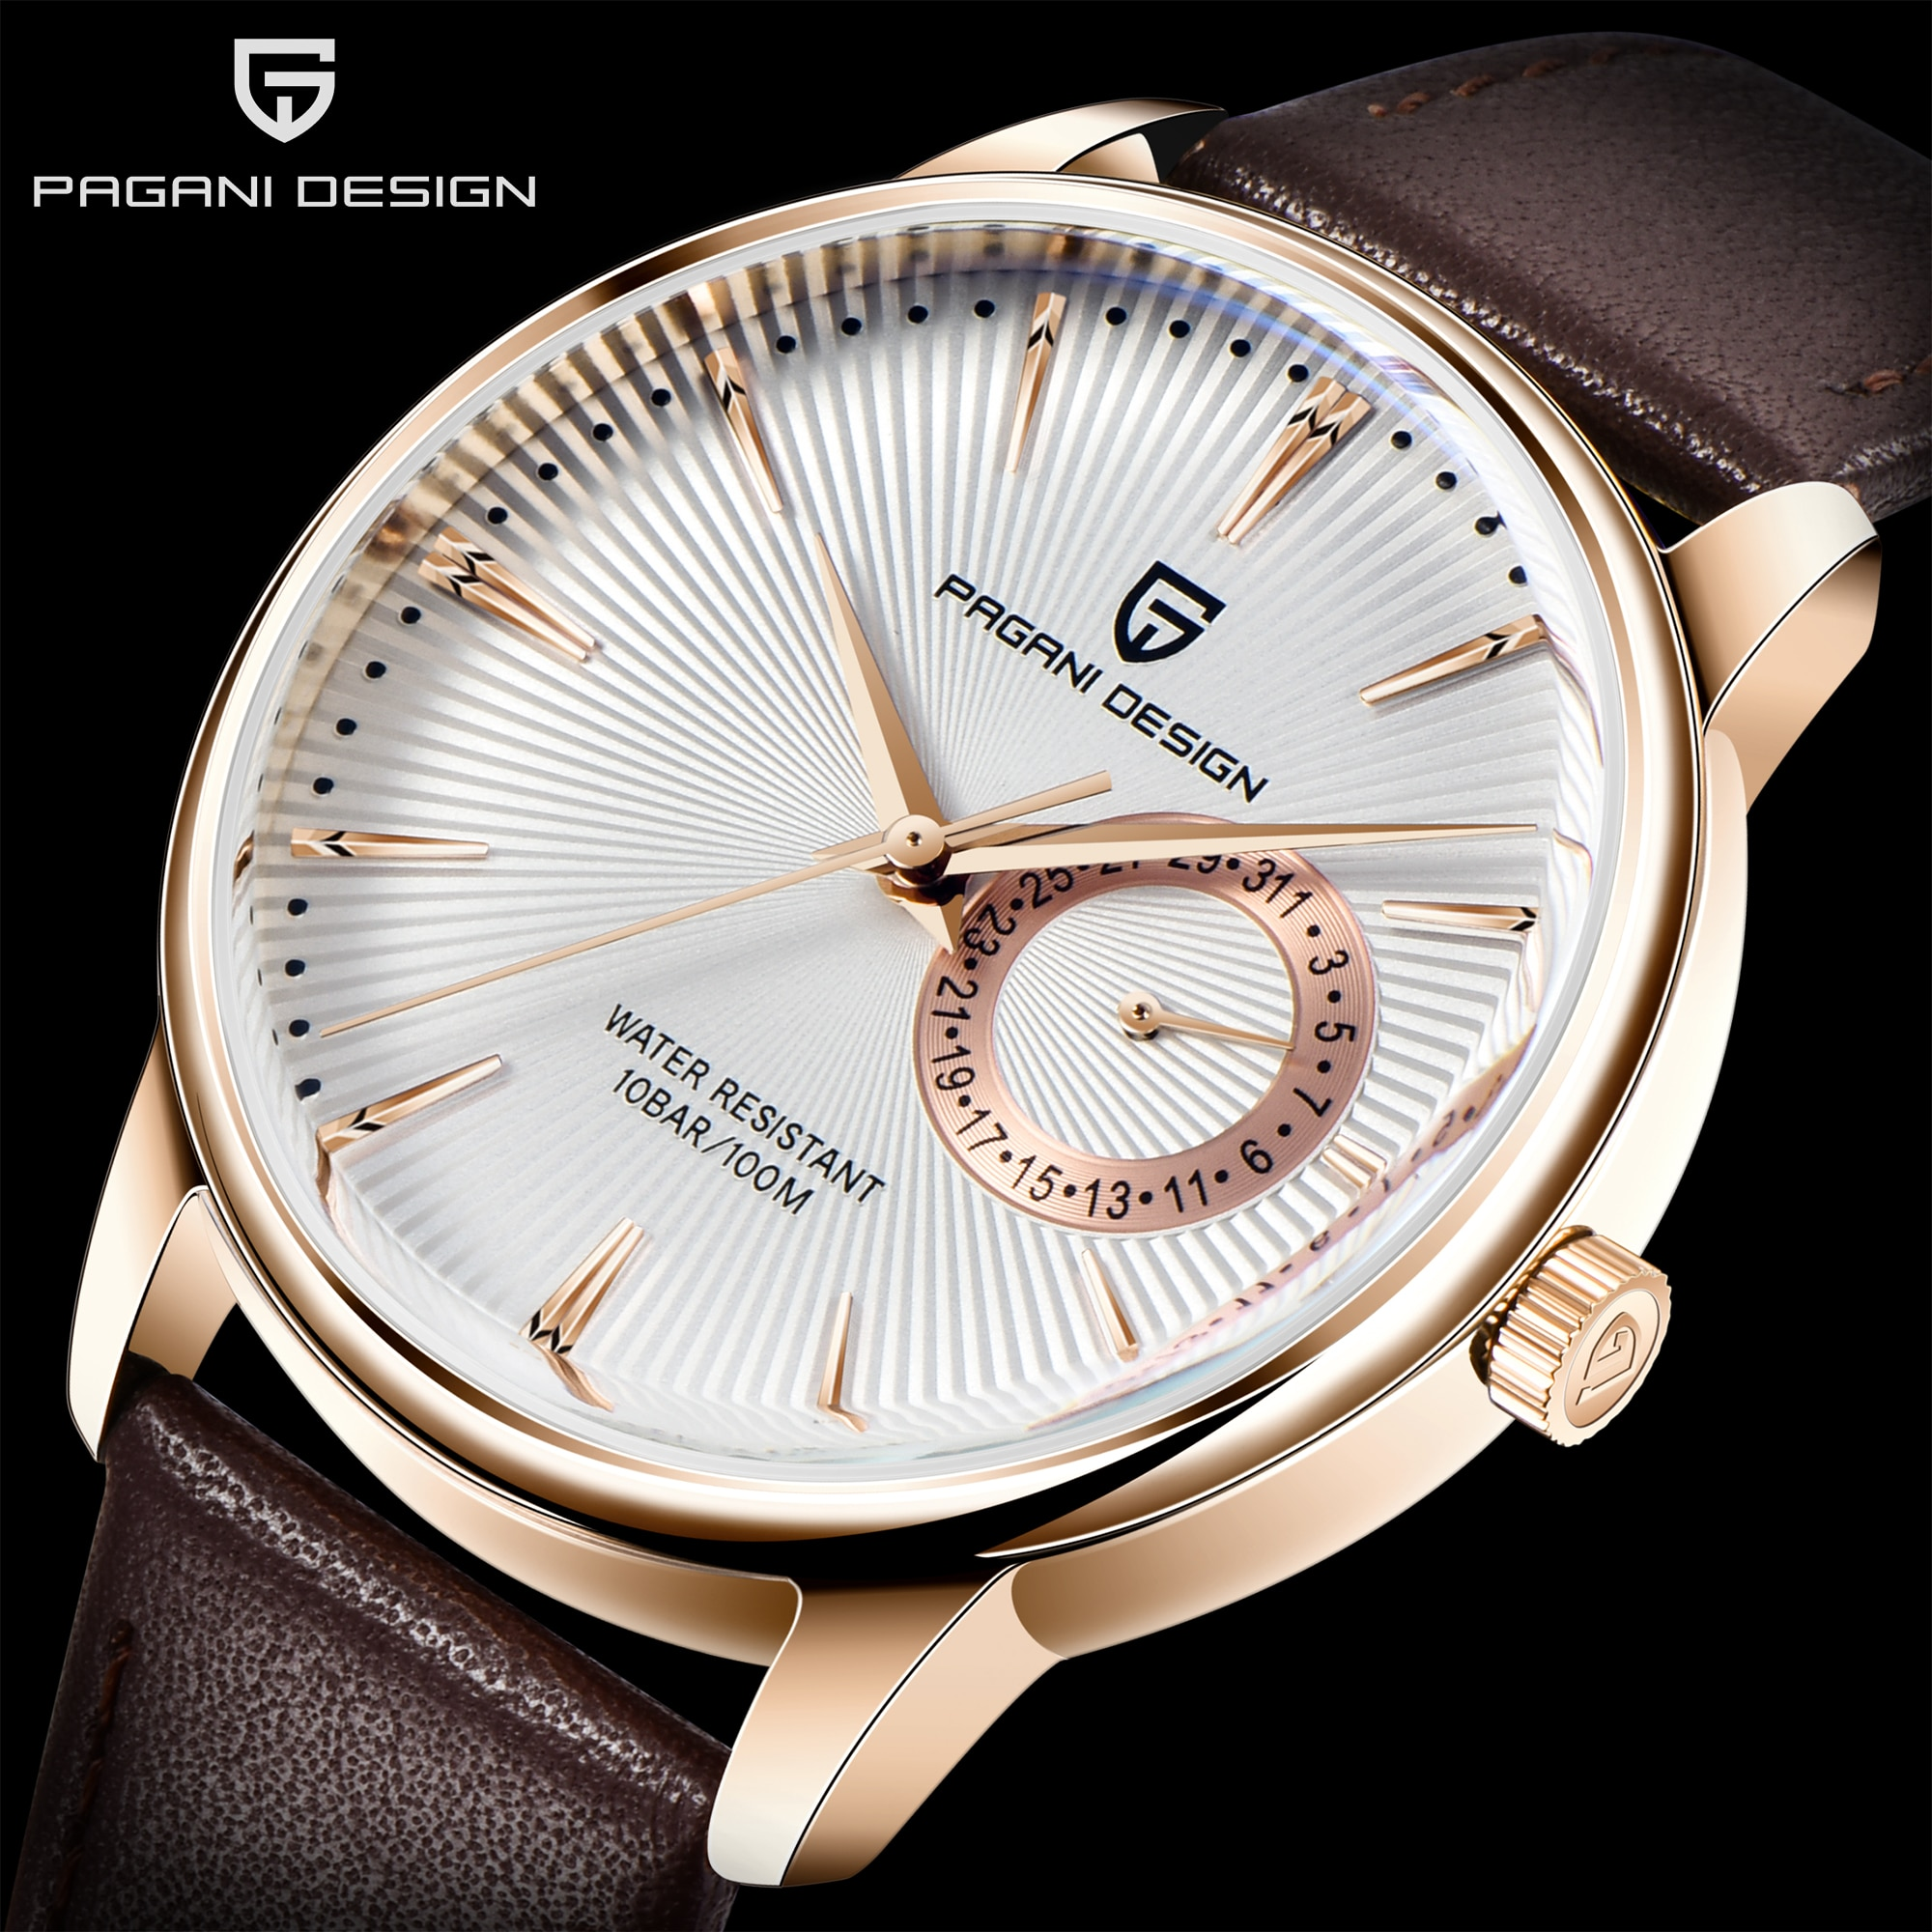 2021 PAGANI تصميم العلامة التجارية الفاخرة مقاوم للماء الرجال ساعة كوارتز موضة عادية ساعة رياضية الرجال العسكرية ساعة Relogio Masculino